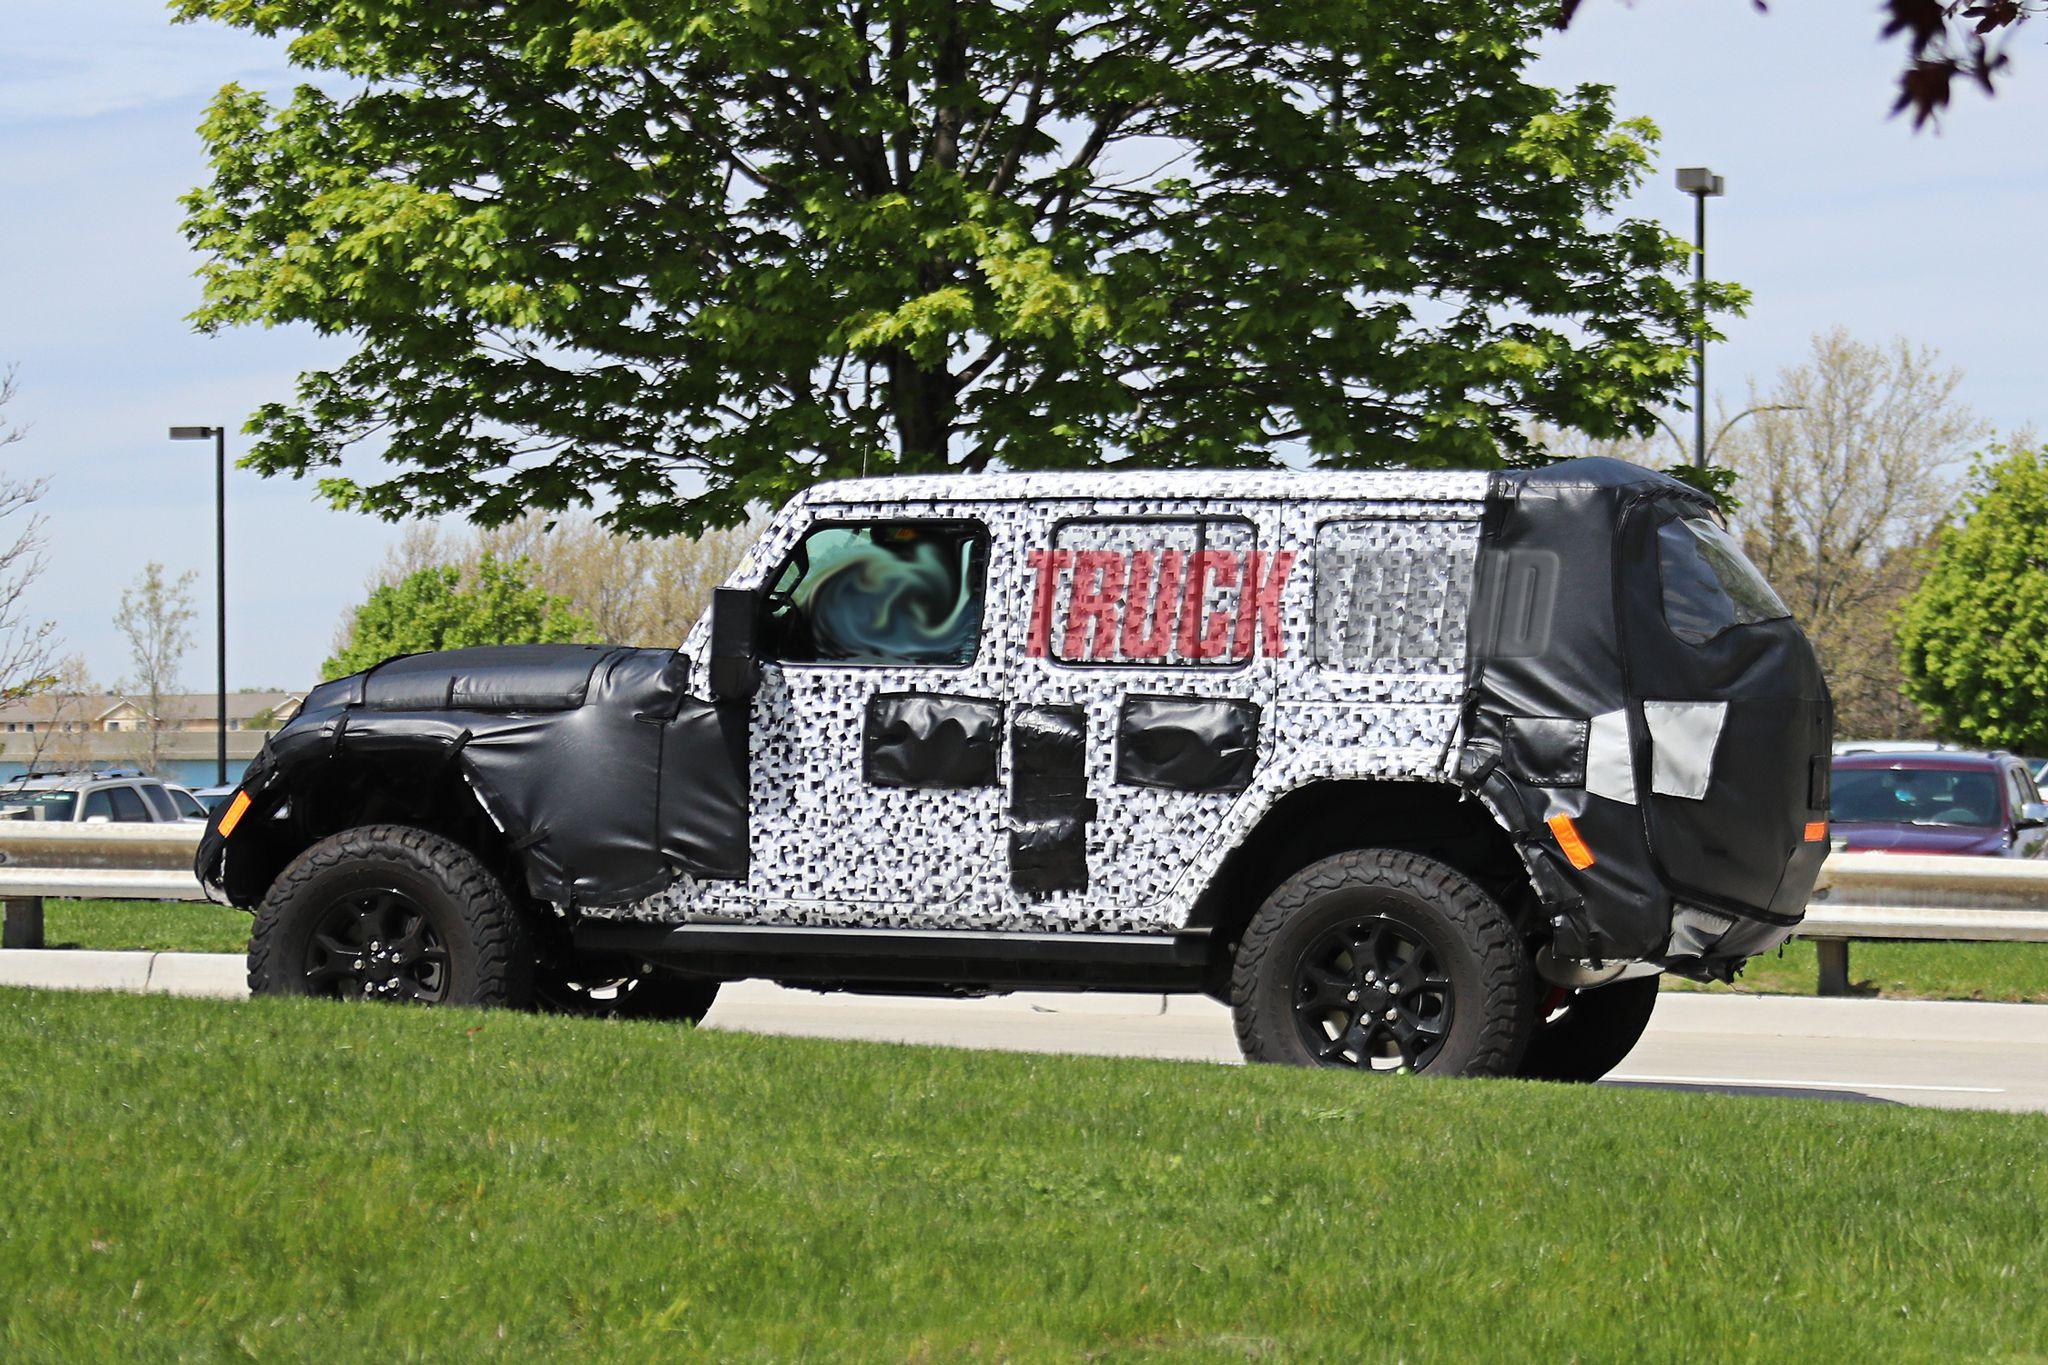 Jeep Wrangler Diesel >> 2018 Jeep JL Wrangler - SPIED! Spy Photos, Price, Release date